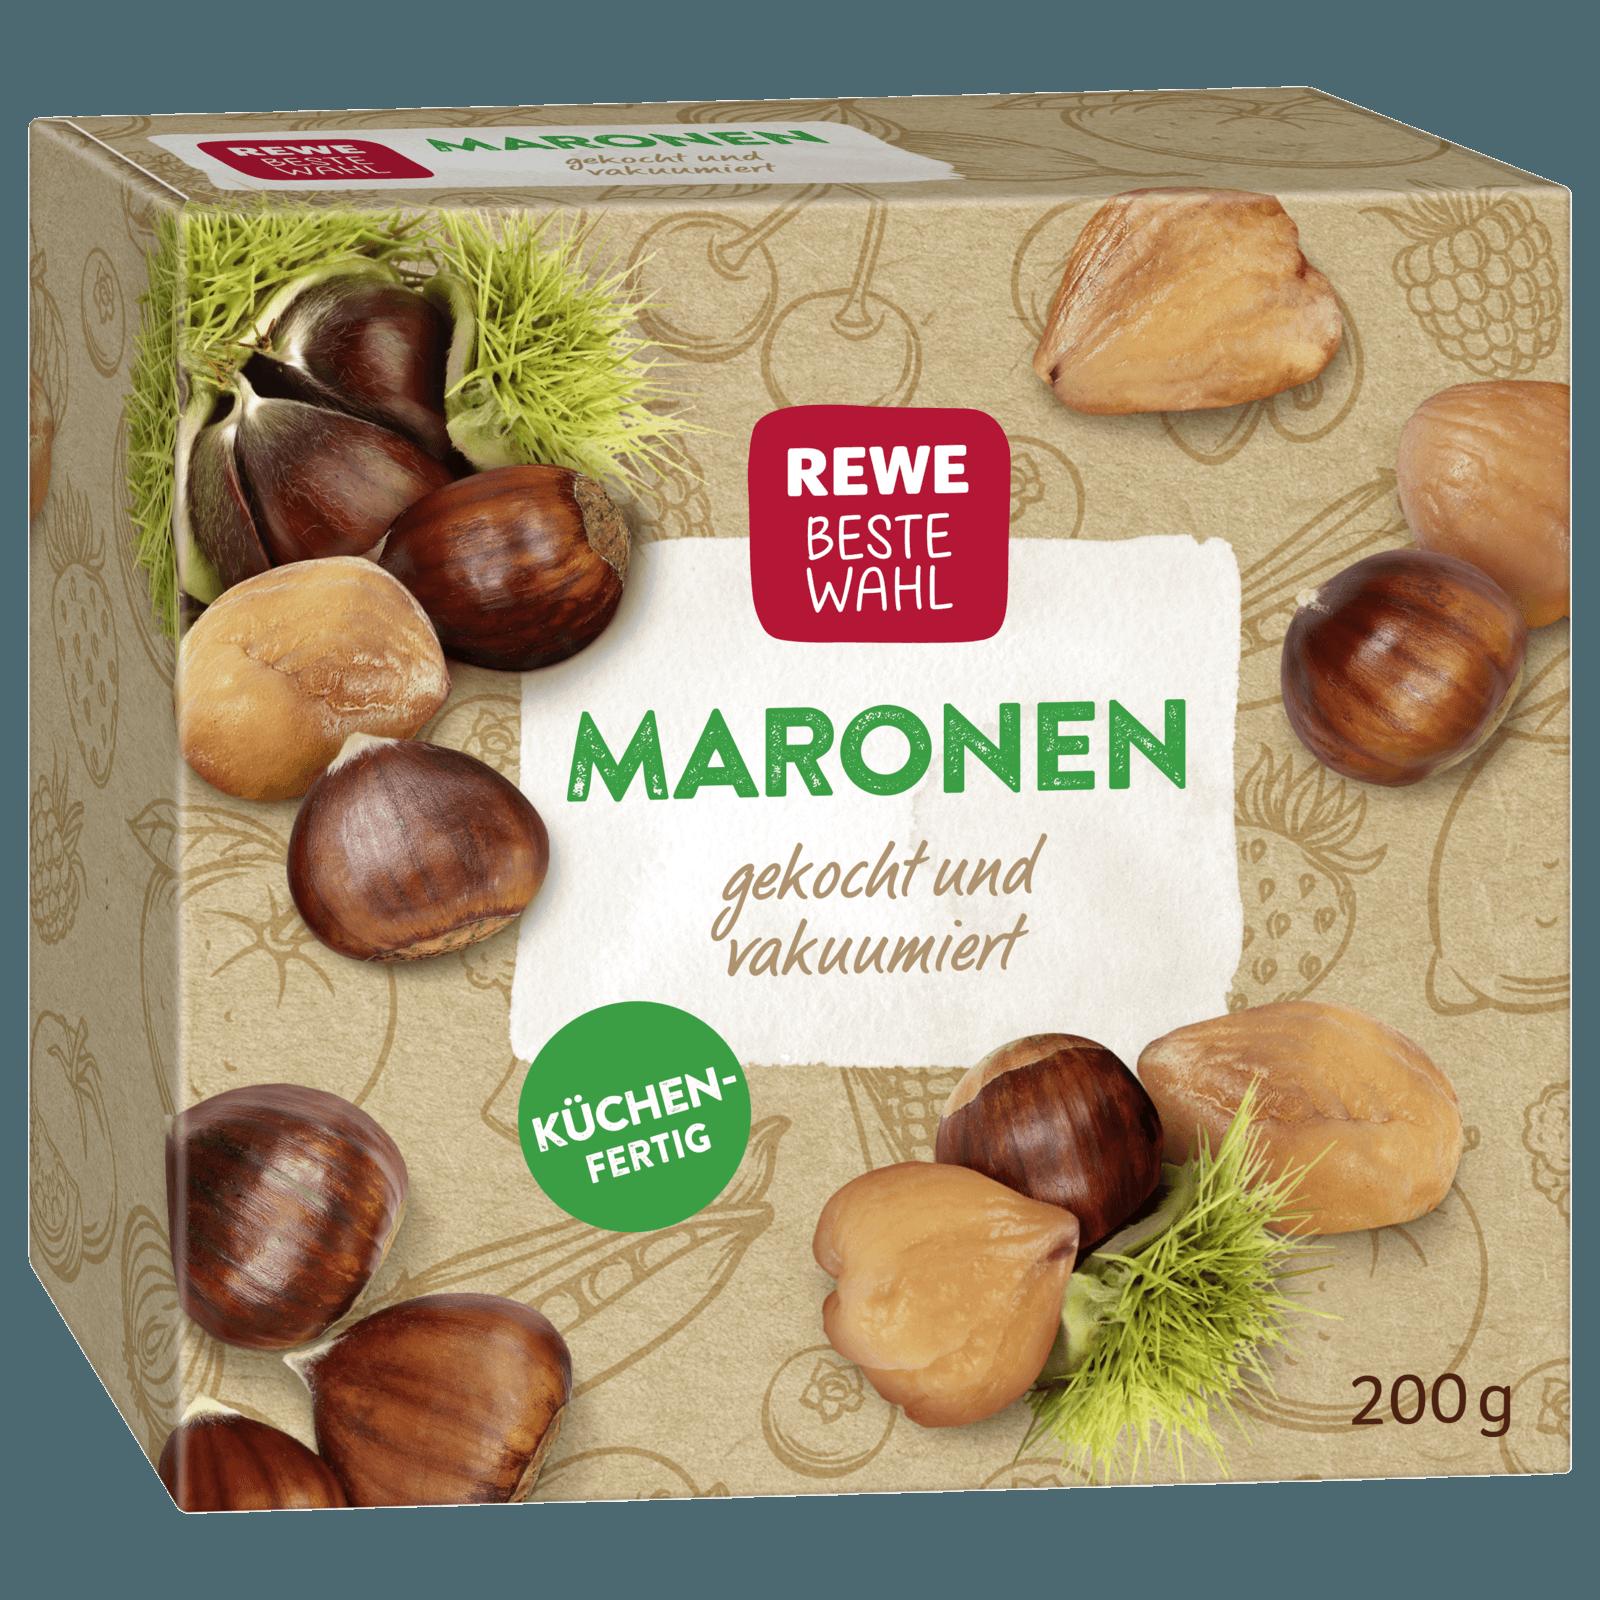 REWE Beste Wahl Maronen gekocht & vakuumiert 200g